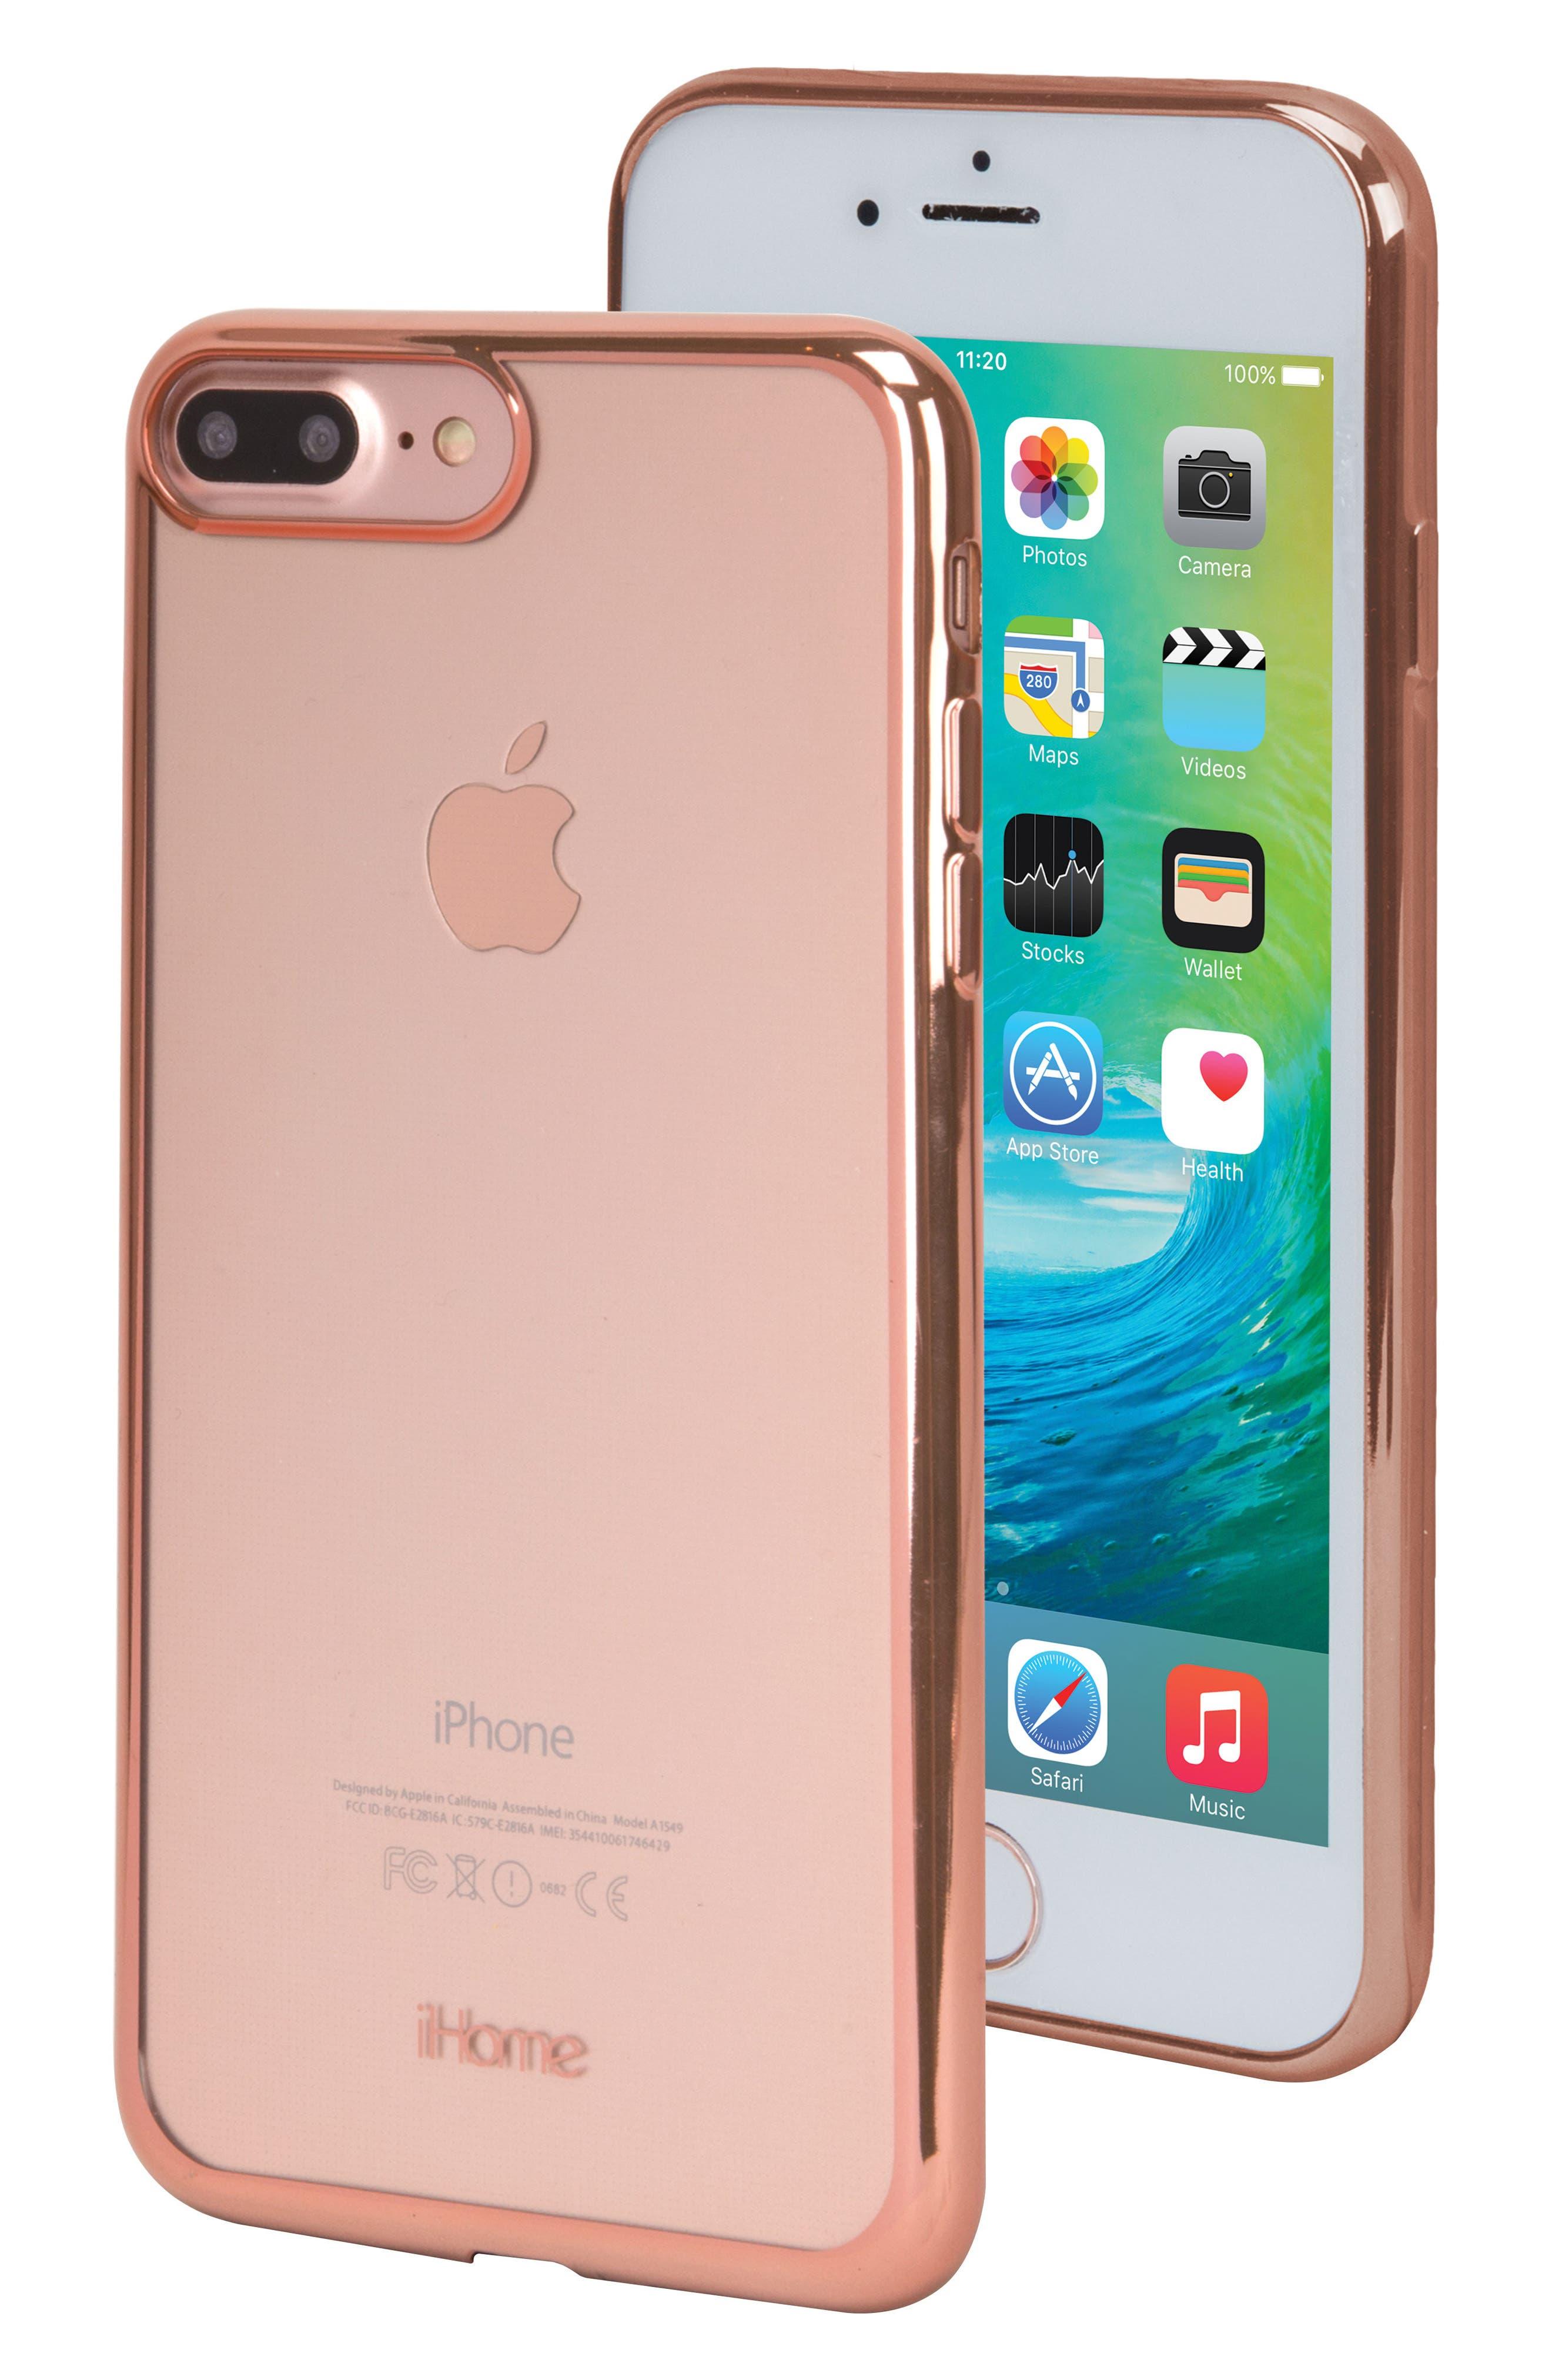 IHOME Lux iPhone 6/7 & 6/7 Plus Case